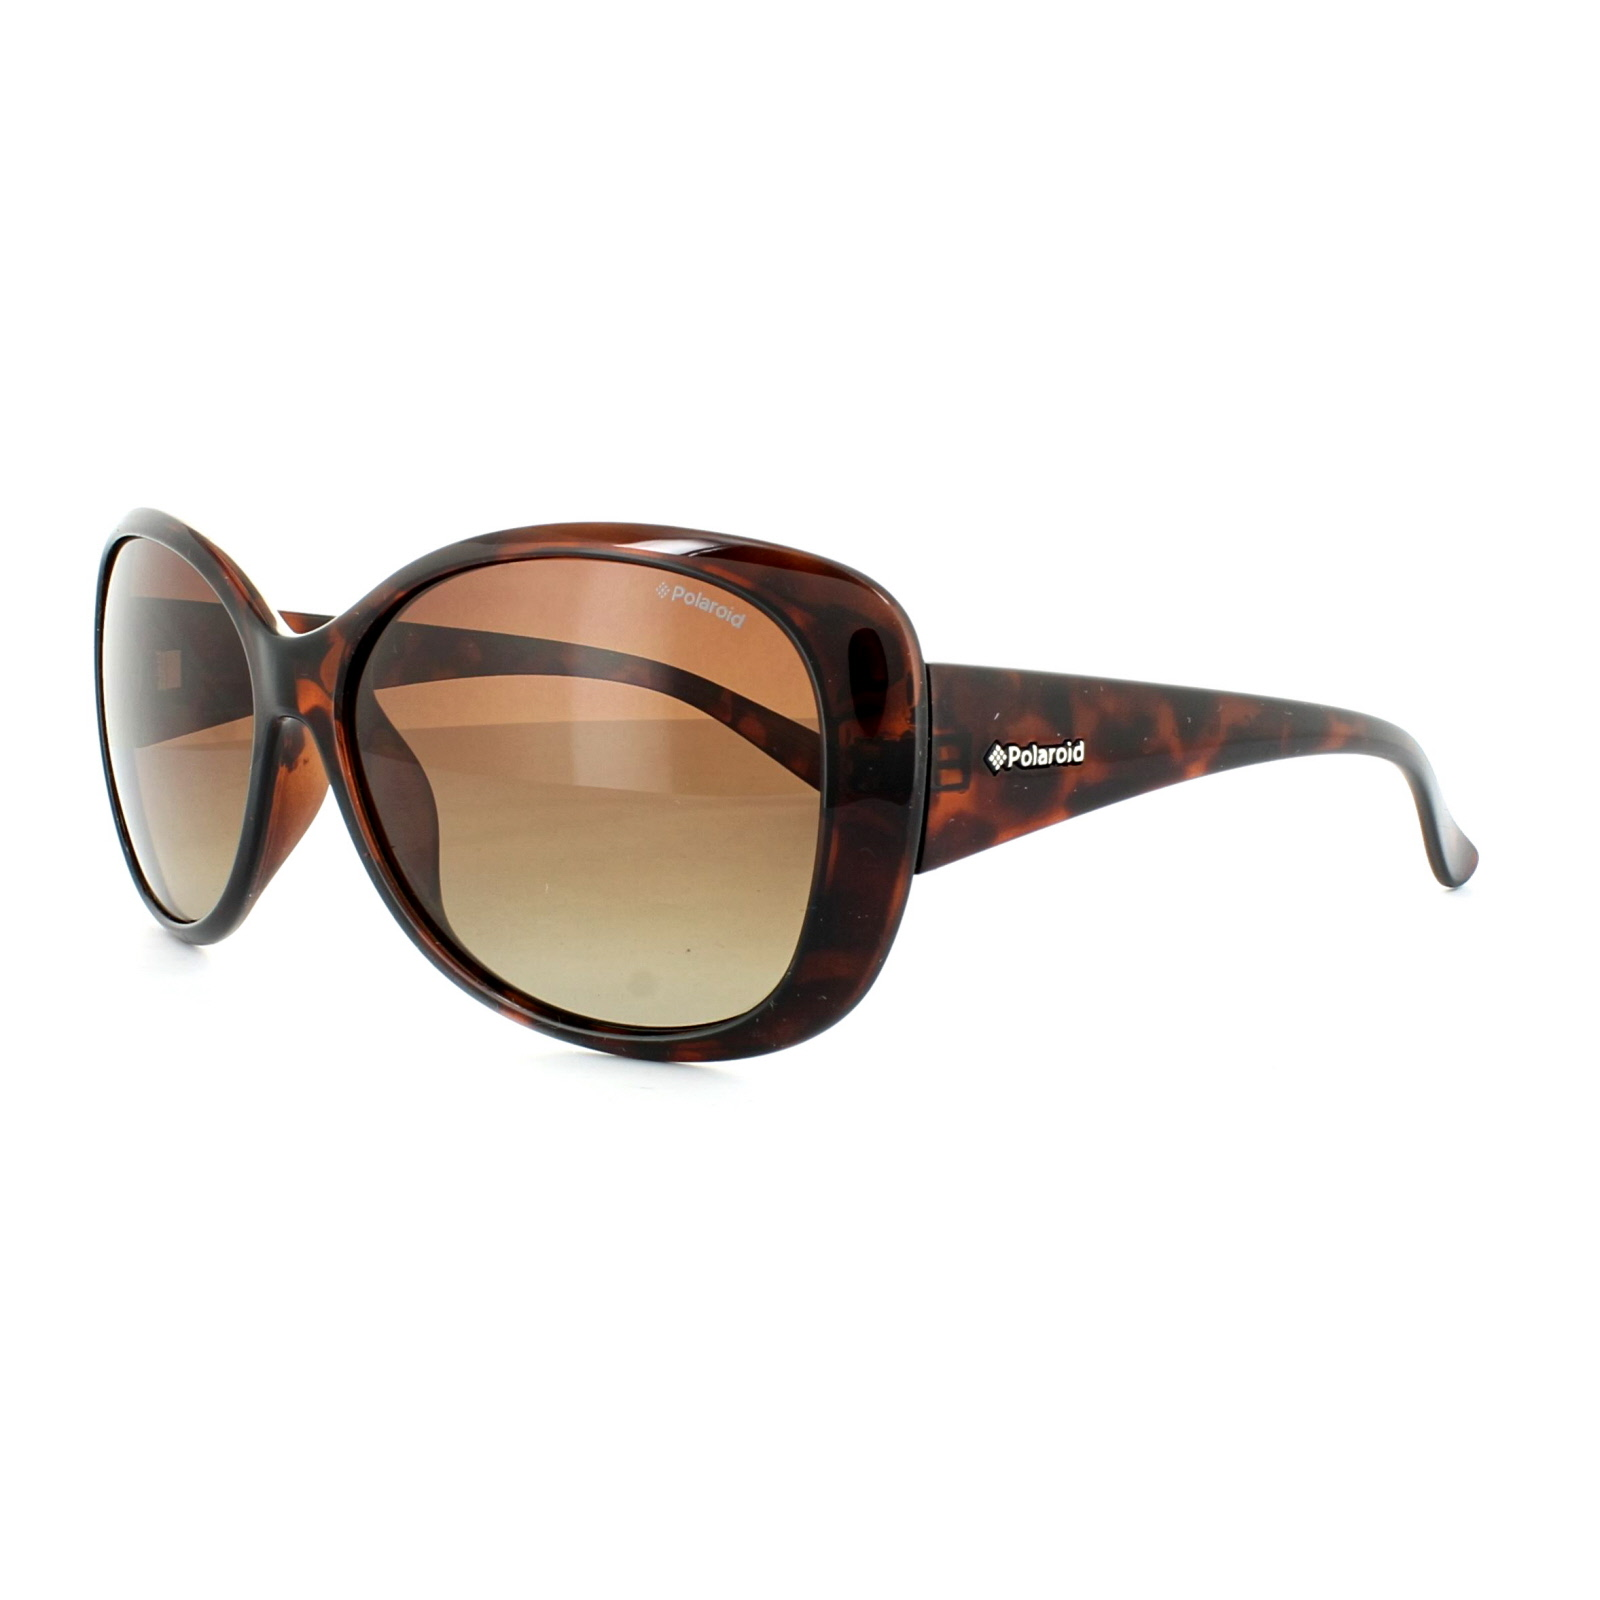 Para Mujer De Las Gafas De Sol Rectangulares P8317 Polaroid 0ePp5fqn0